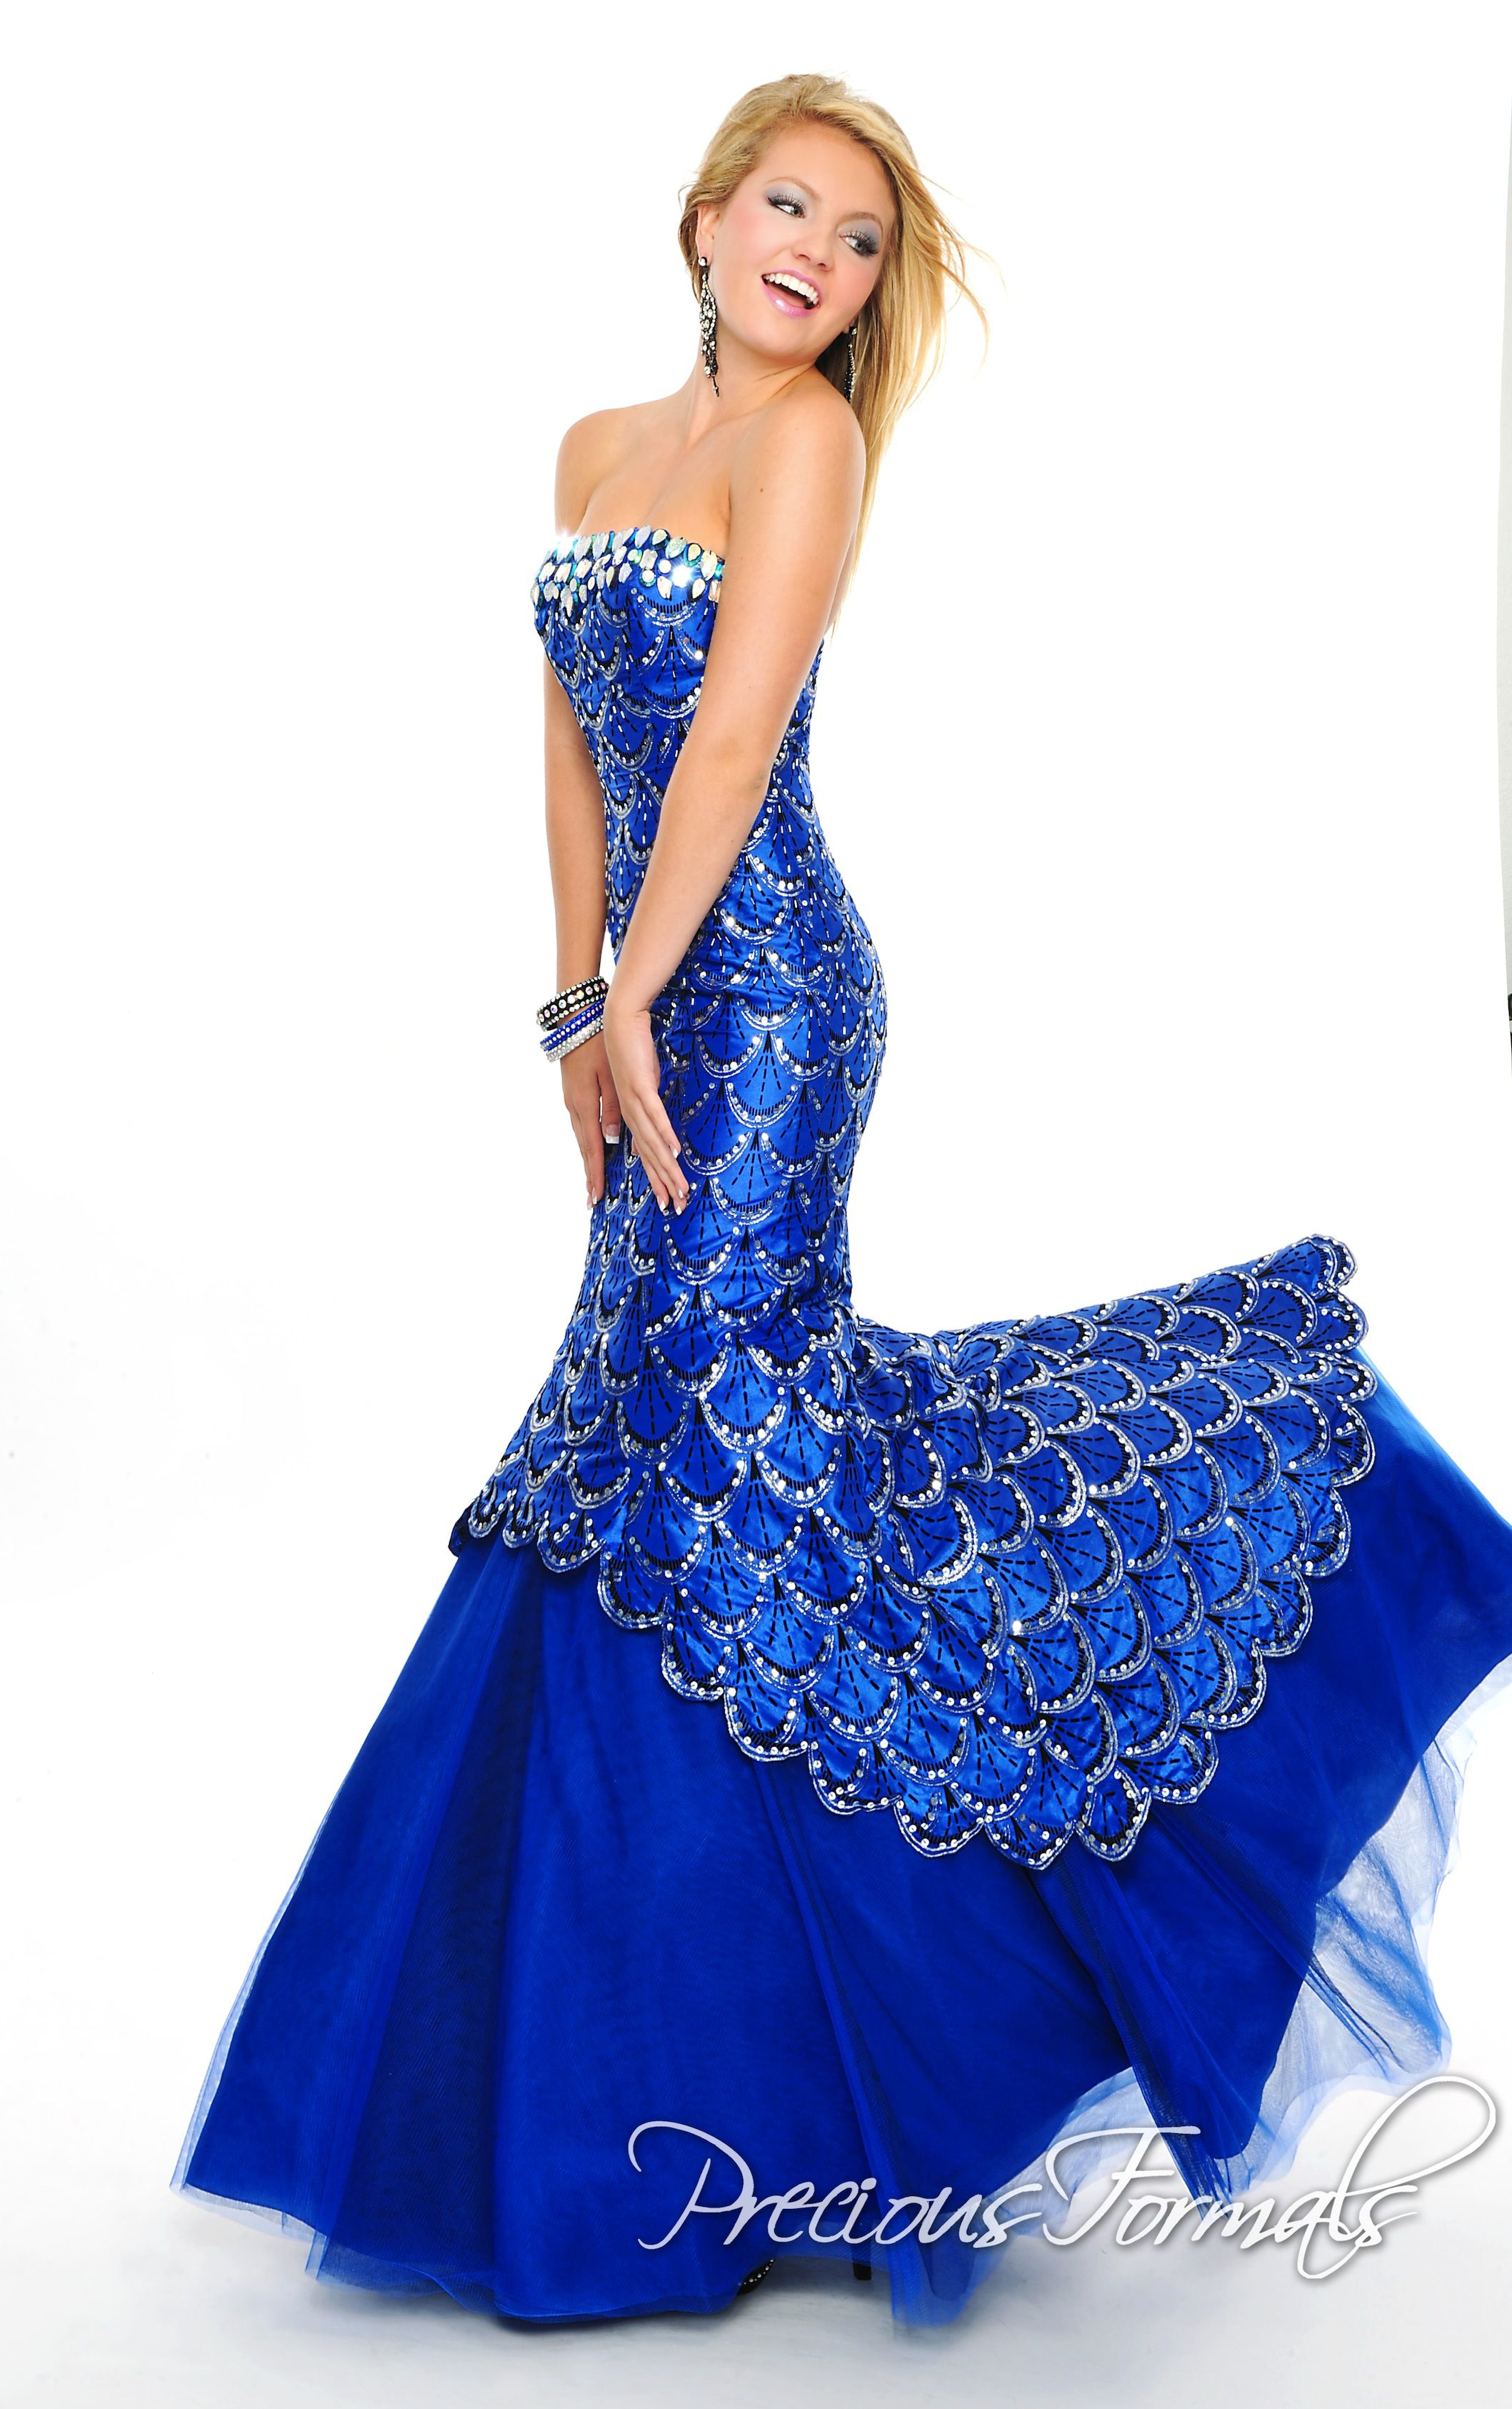 O55173 In Royal Precious Formals Prom Dresses Pinterest Royals